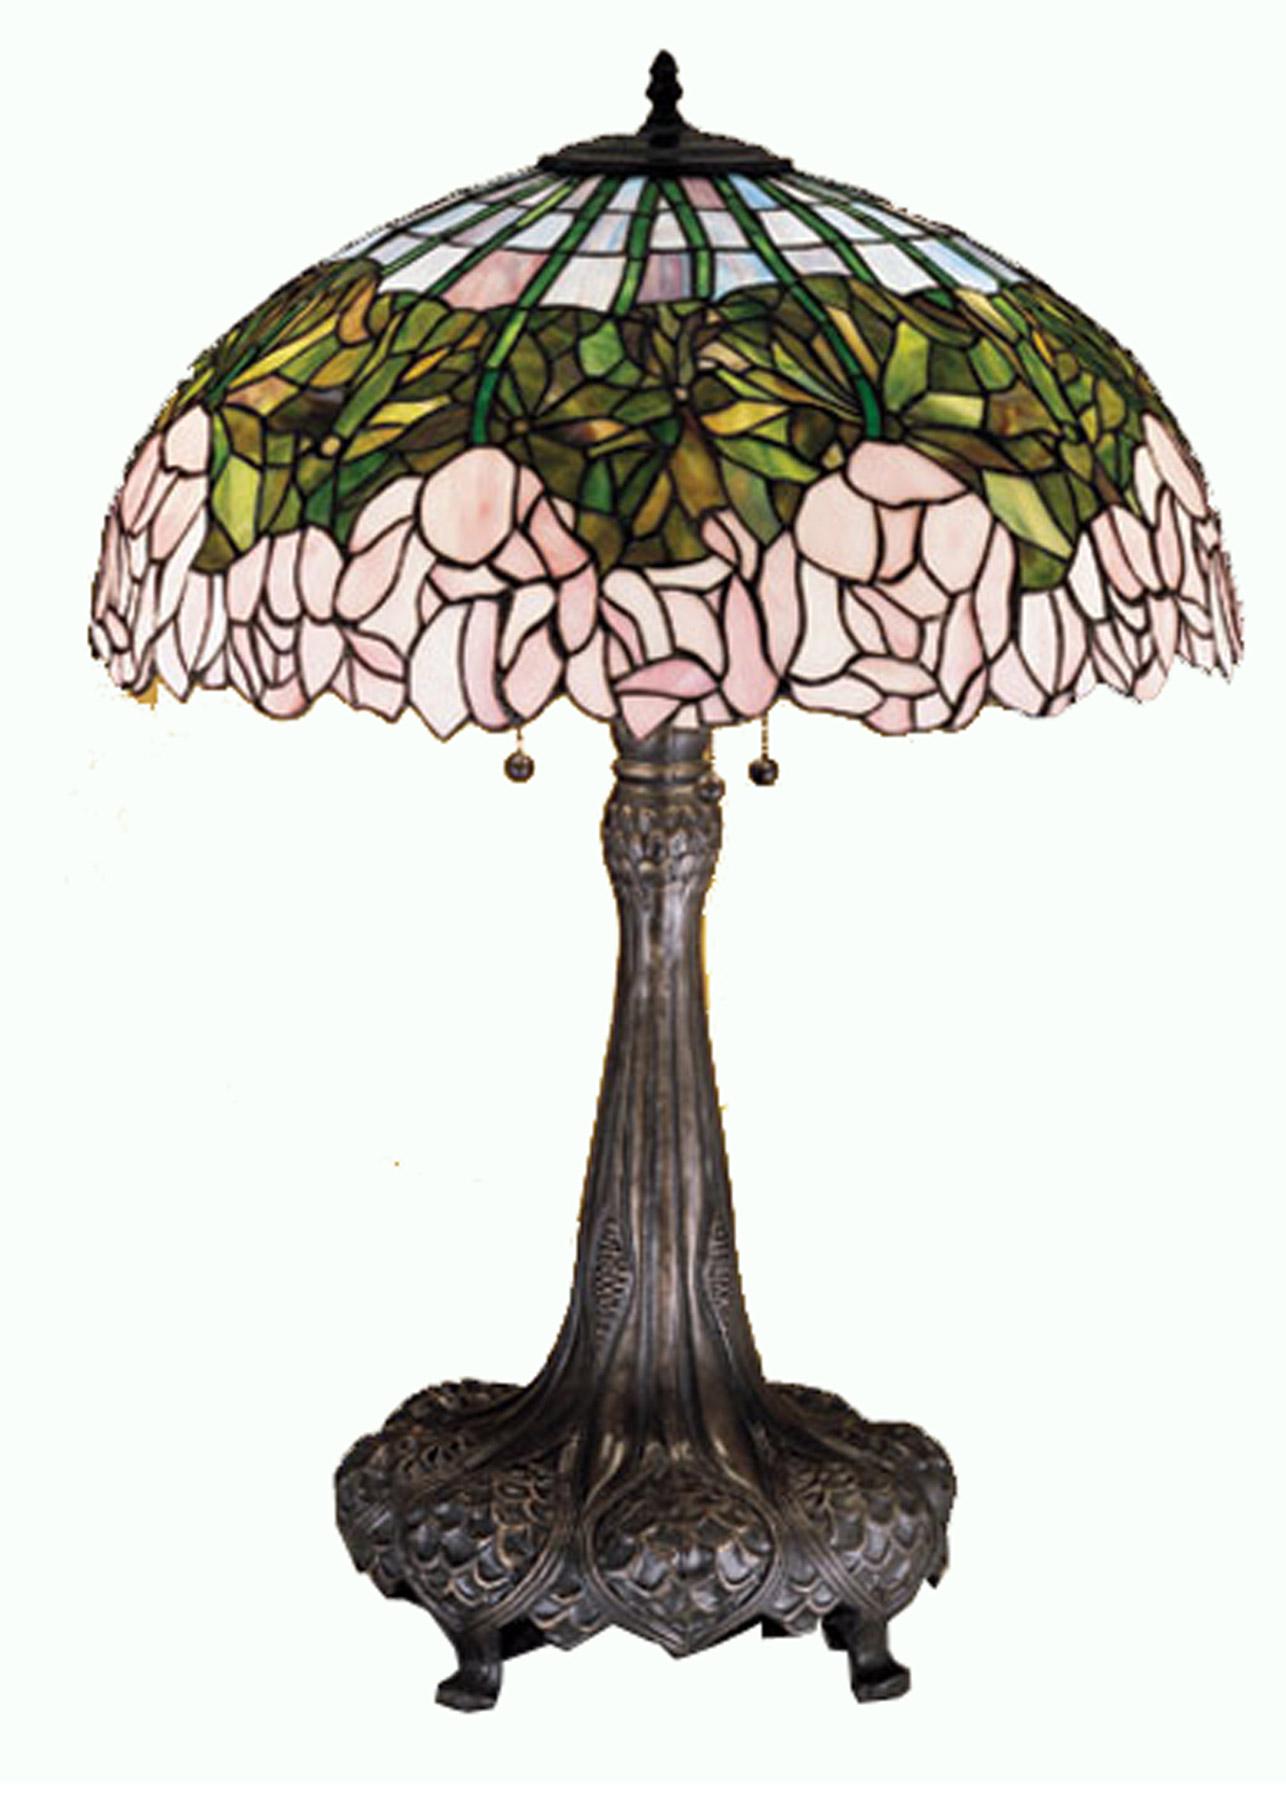 meyda 30513 tiffany cabbage rose large table lamp. Black Bedroom Furniture Sets. Home Design Ideas